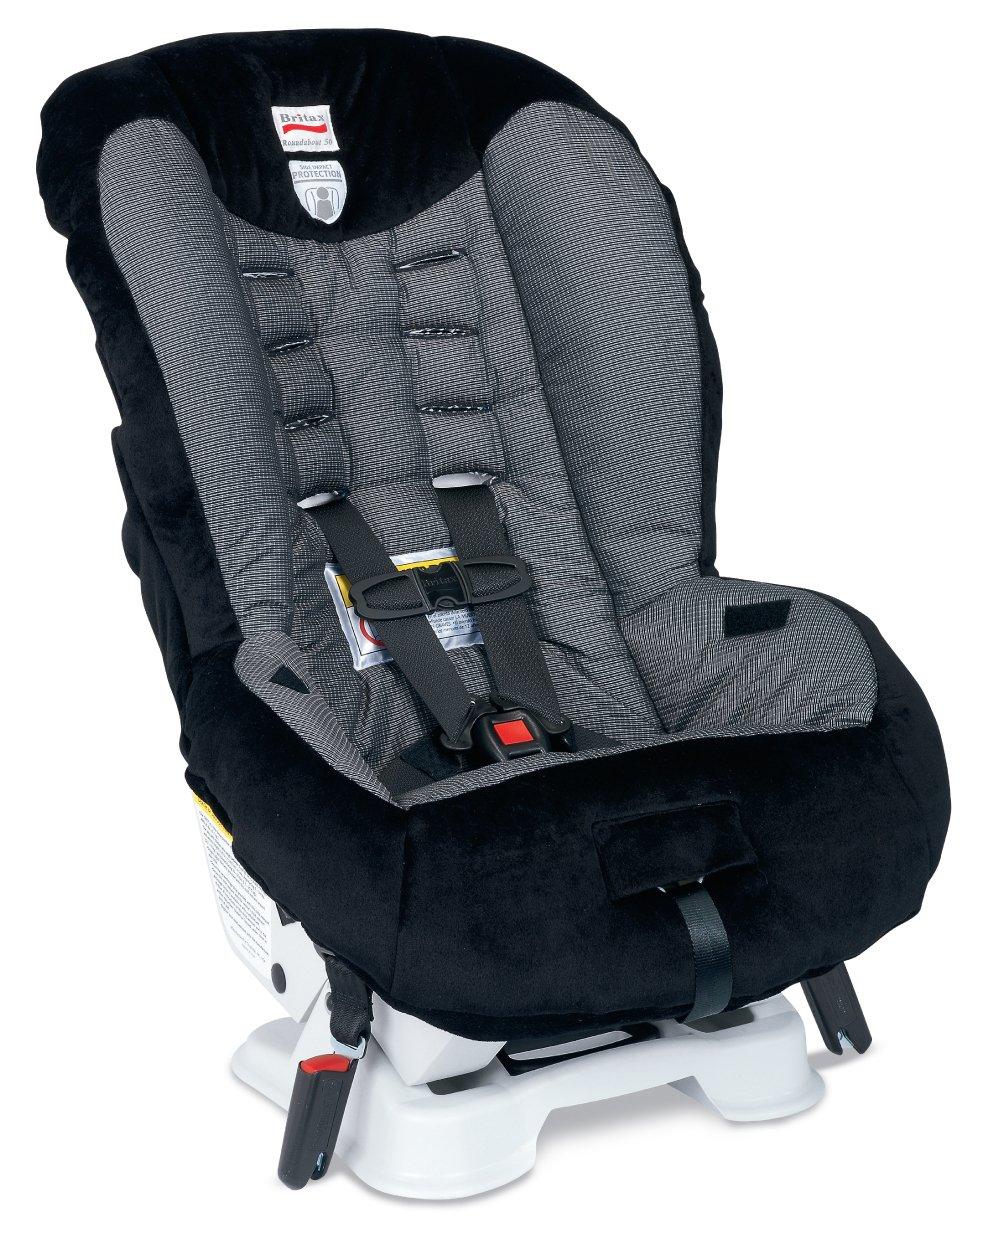 amazon com britax roundabout 50 convertible car seat onyx rh amazon com